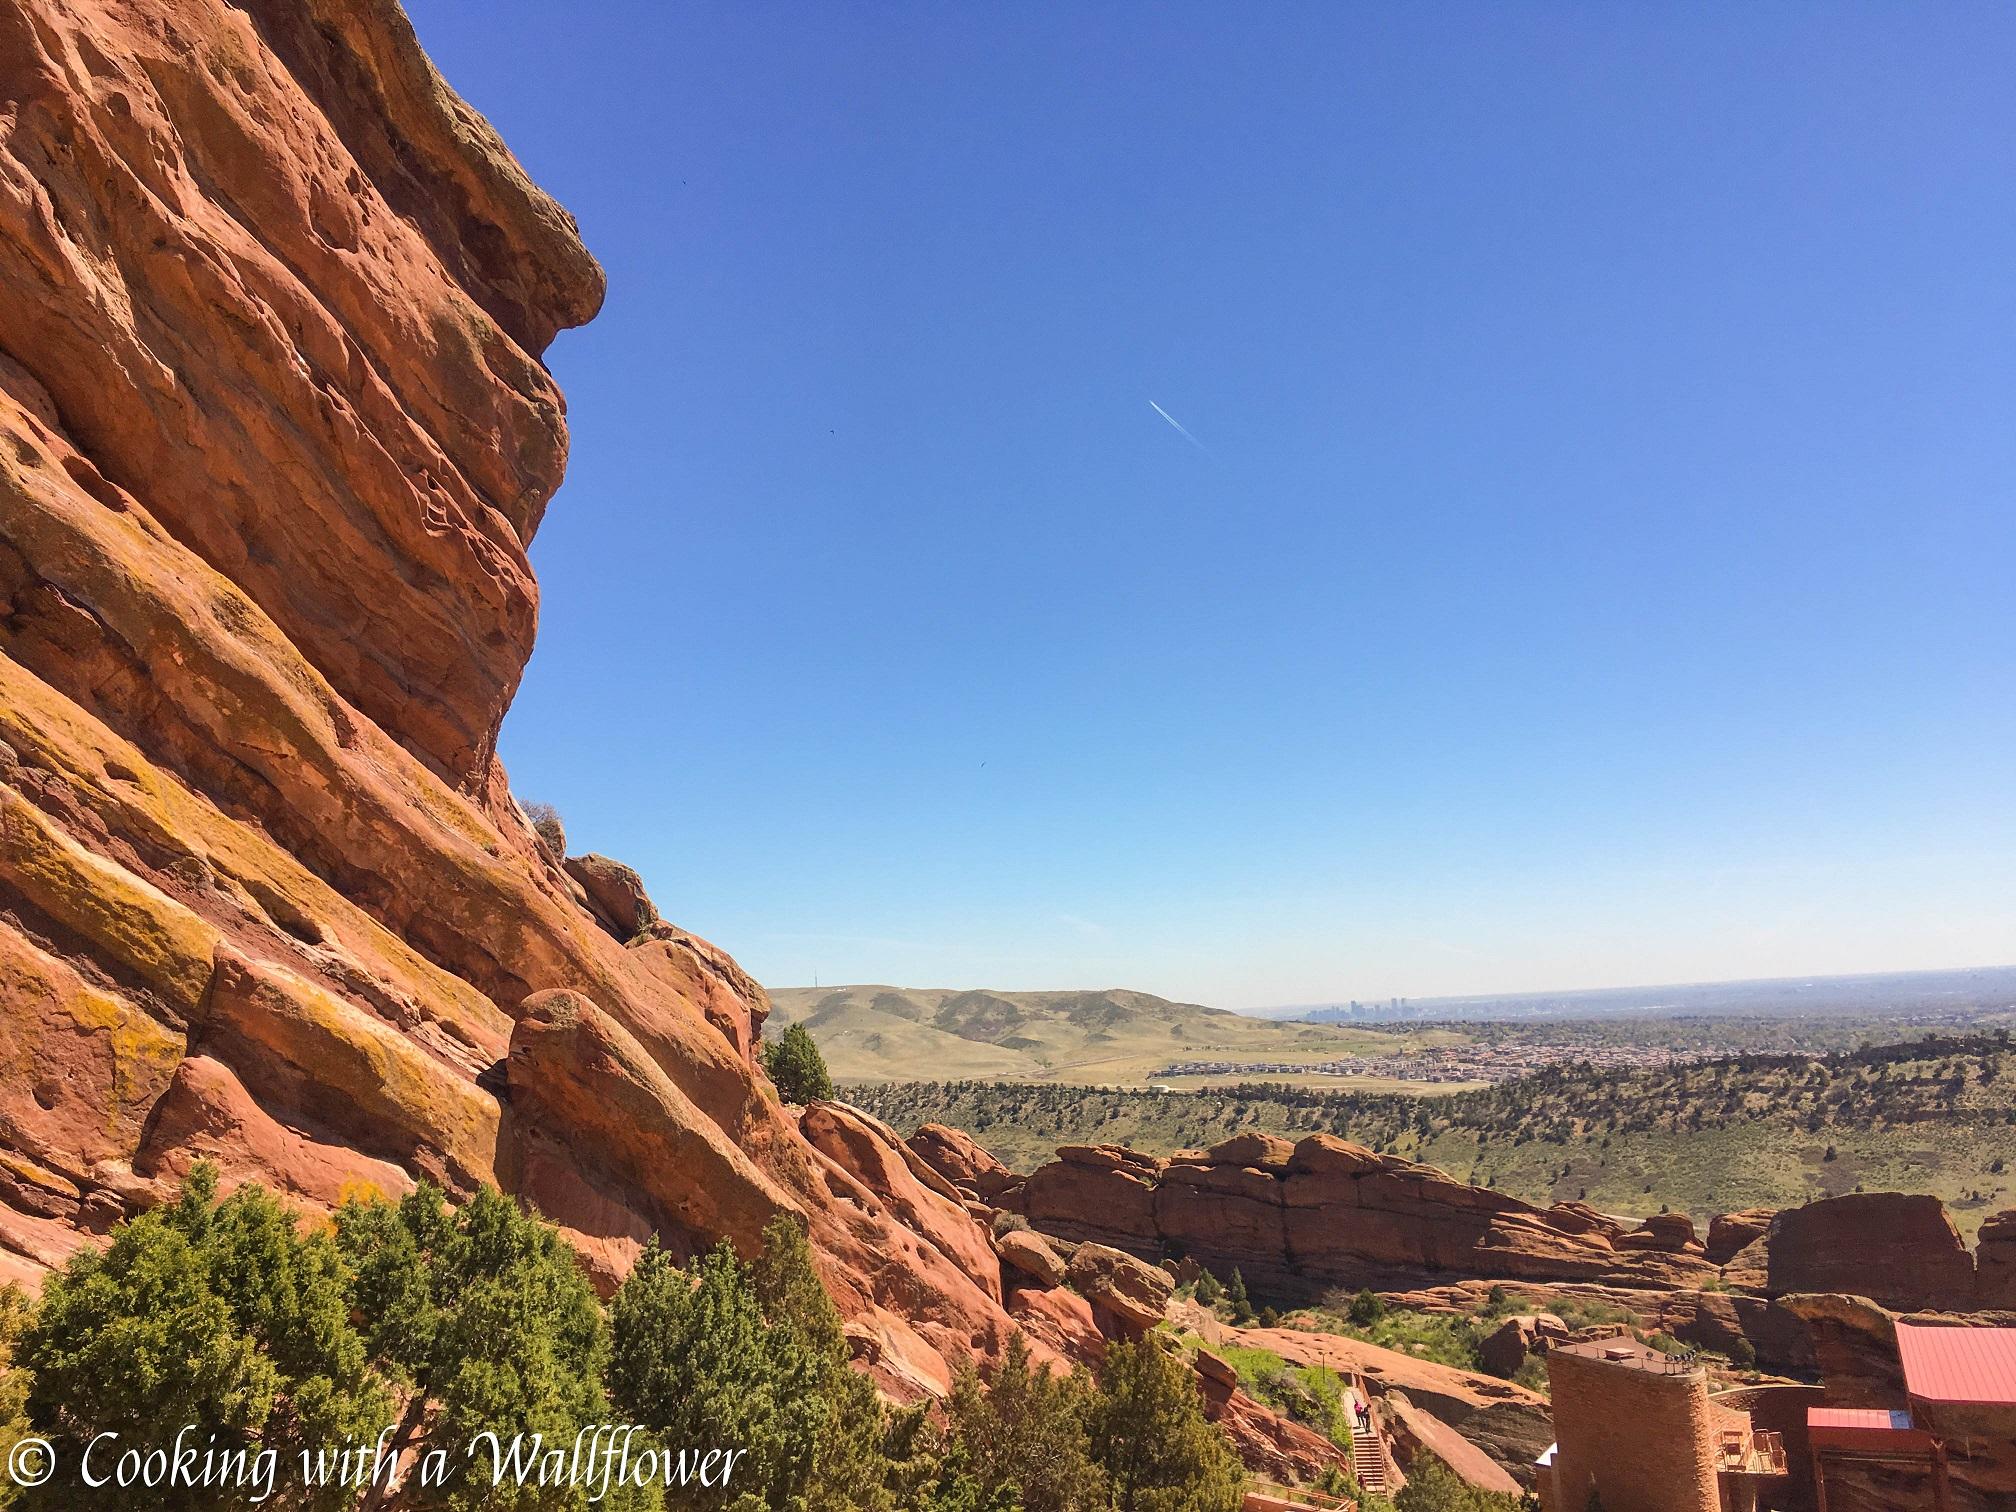 Destination: Discovering Colorado – Day 2